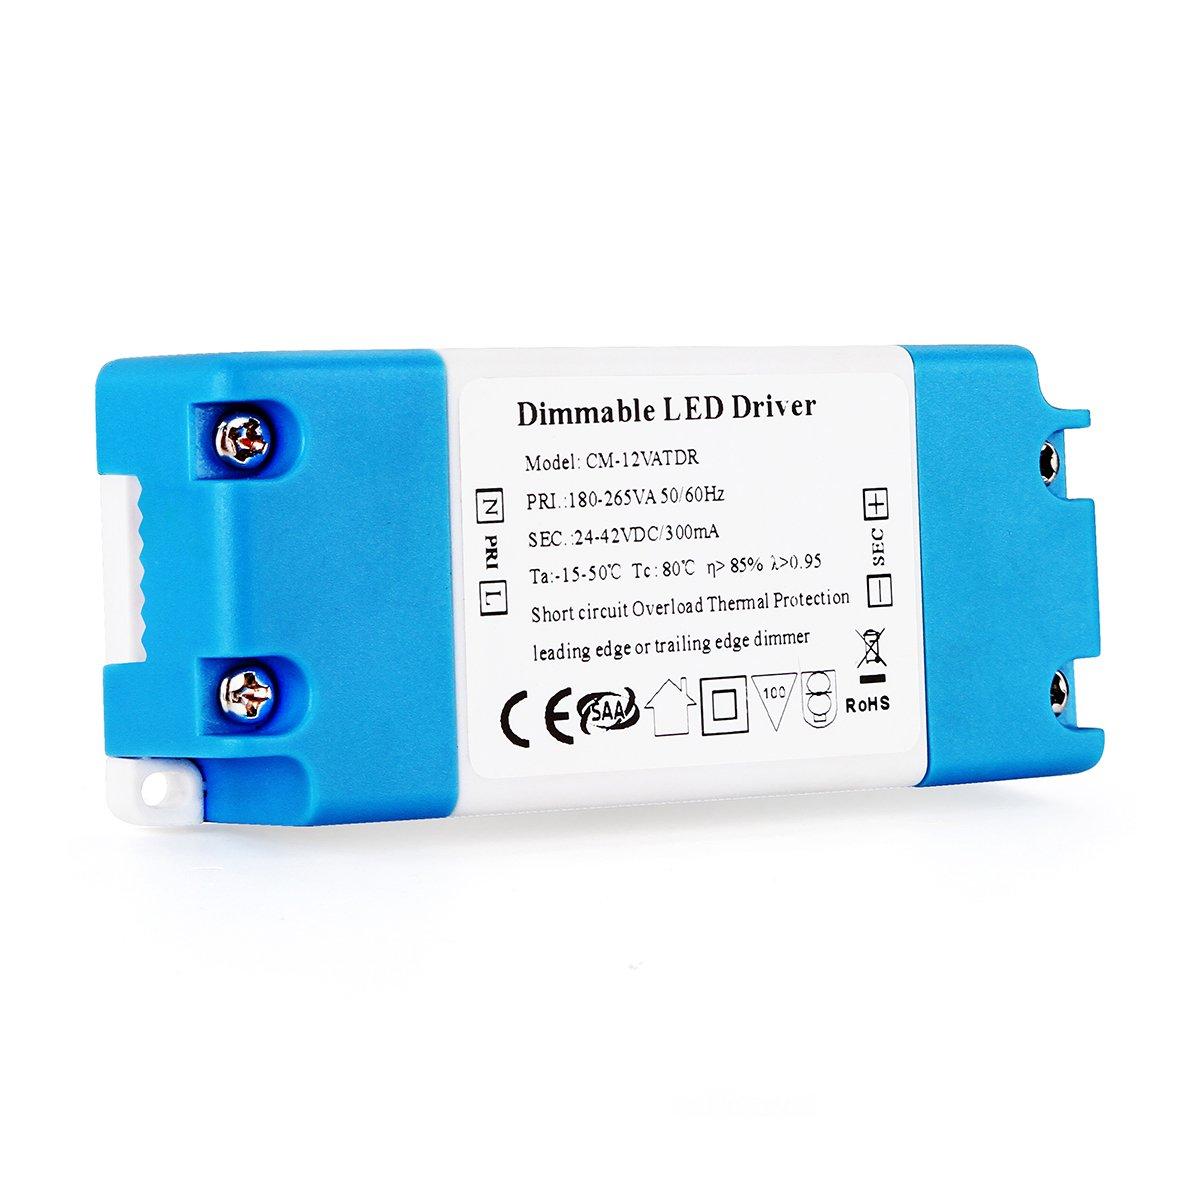 Vipmoon 5 7w Dc Dimmable Led Driver For Bulbs Ceiling Light Circuit Lighting